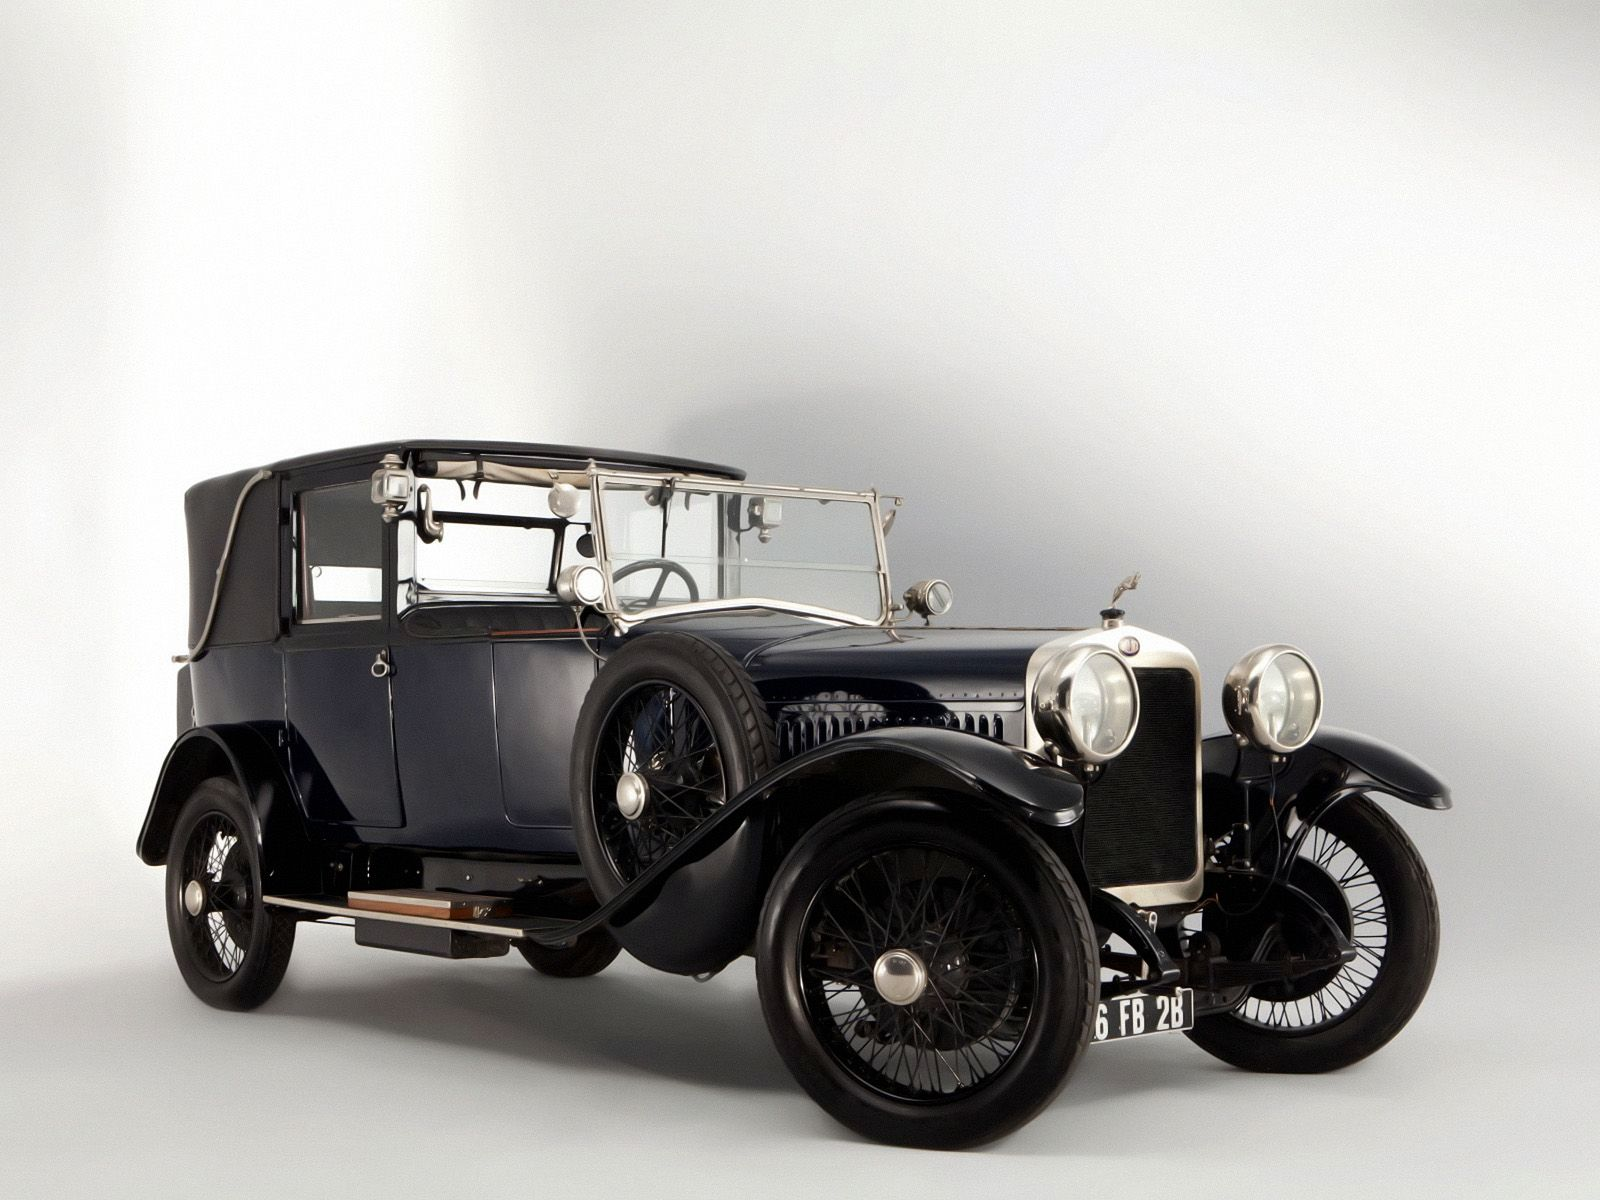 1920 Delage Type Co Coupe Chauffeur Chauffeur Coupe Antique Cars